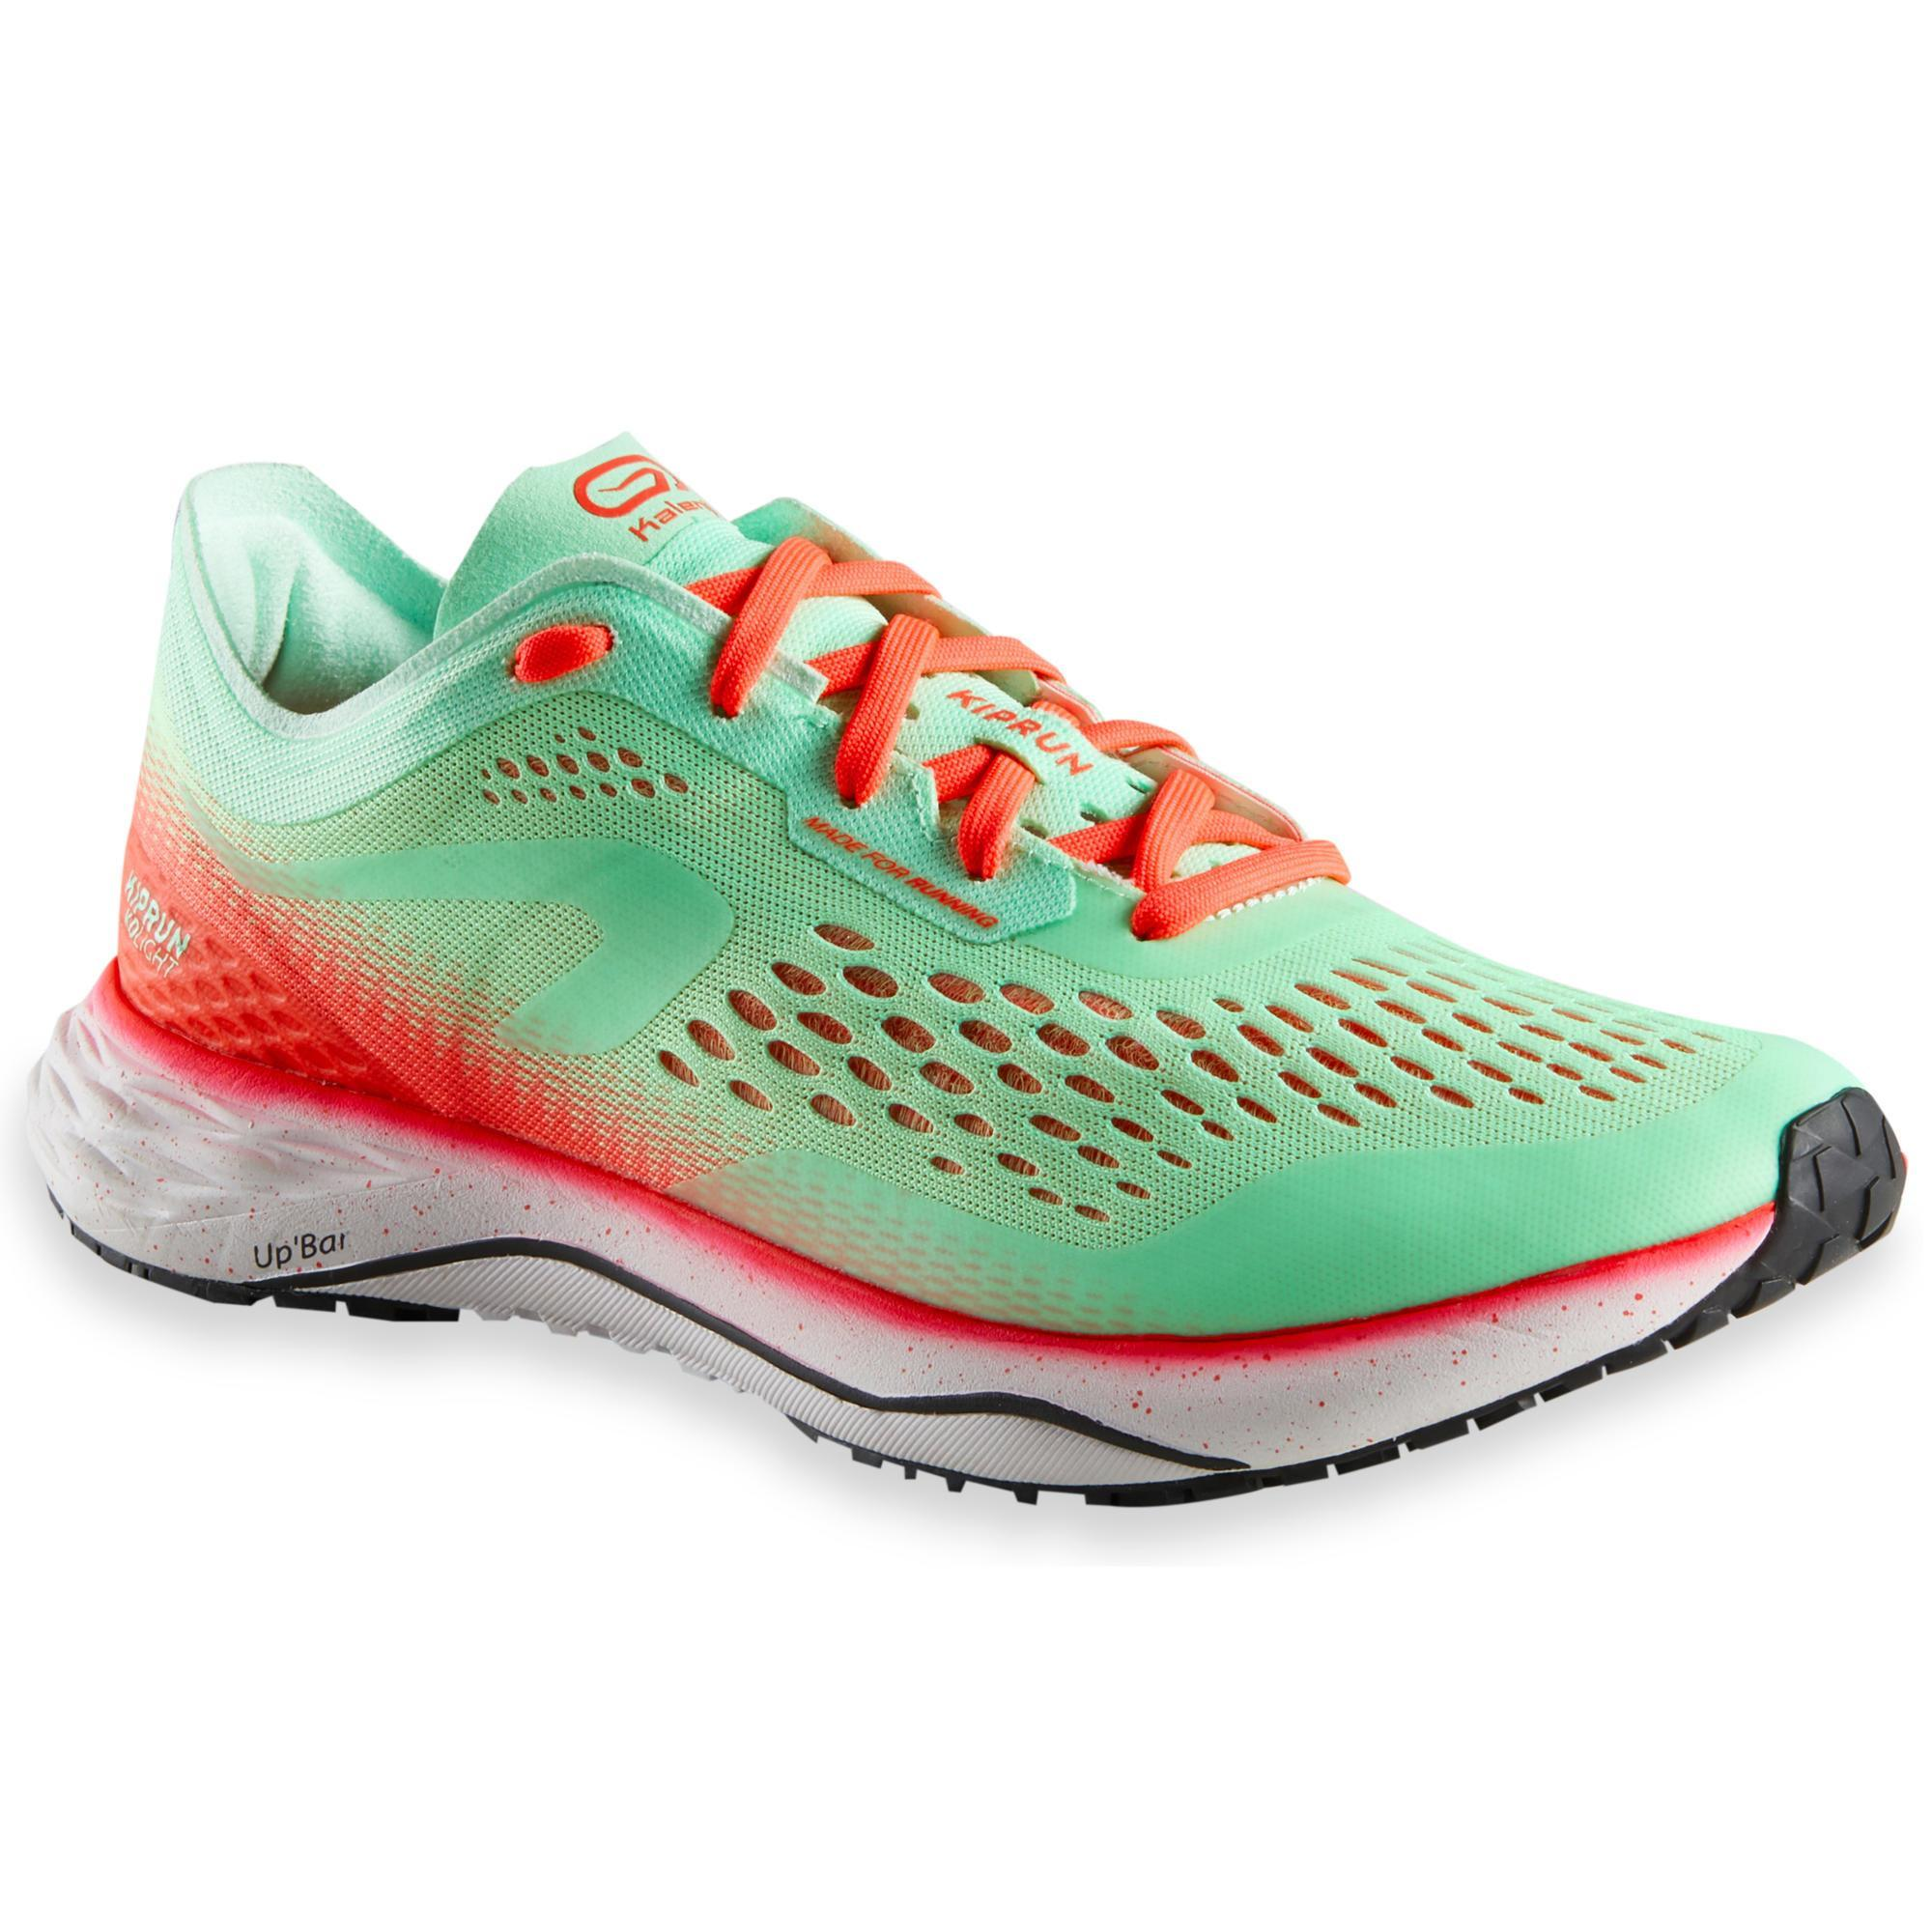 Laufschuhe Kiprun KD Light Damen grün/koralle | Schuhe > Sportschuhe | Grün - Rot - Rosa | Kalenji